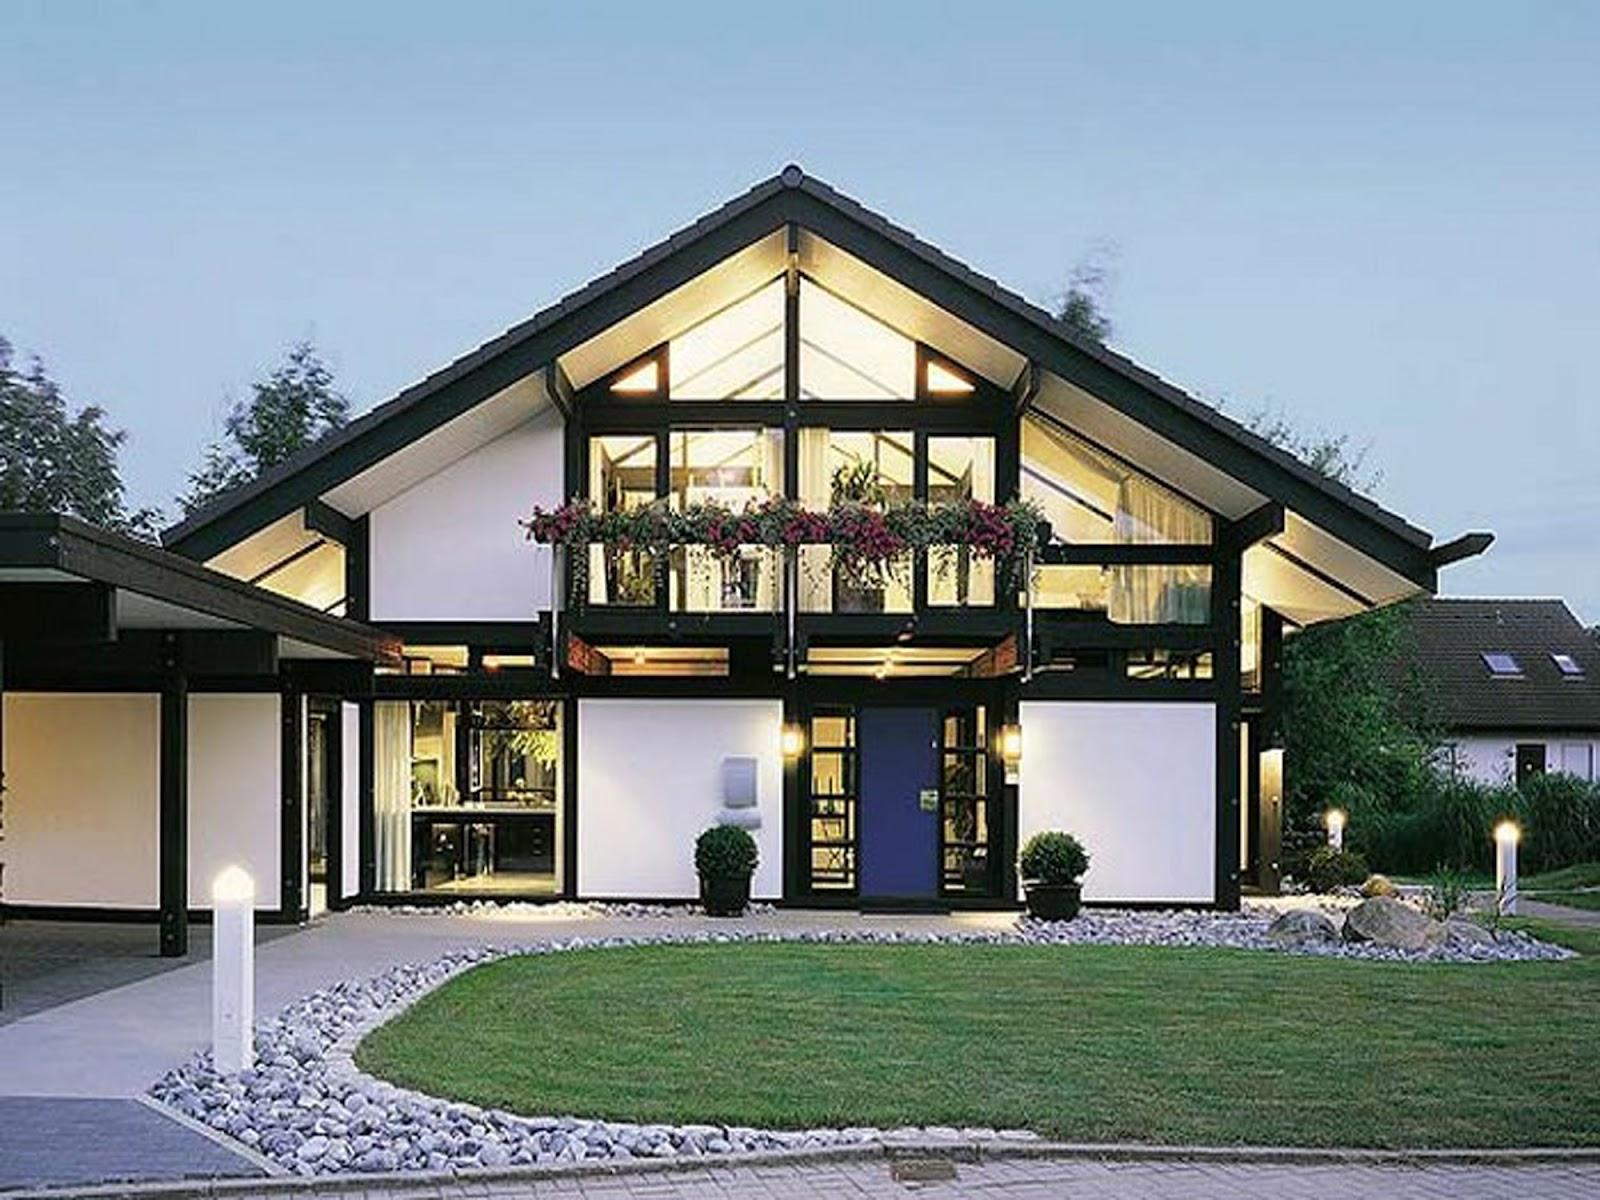 Modern home design for inspirations interior home design - Home internal decoration property ...